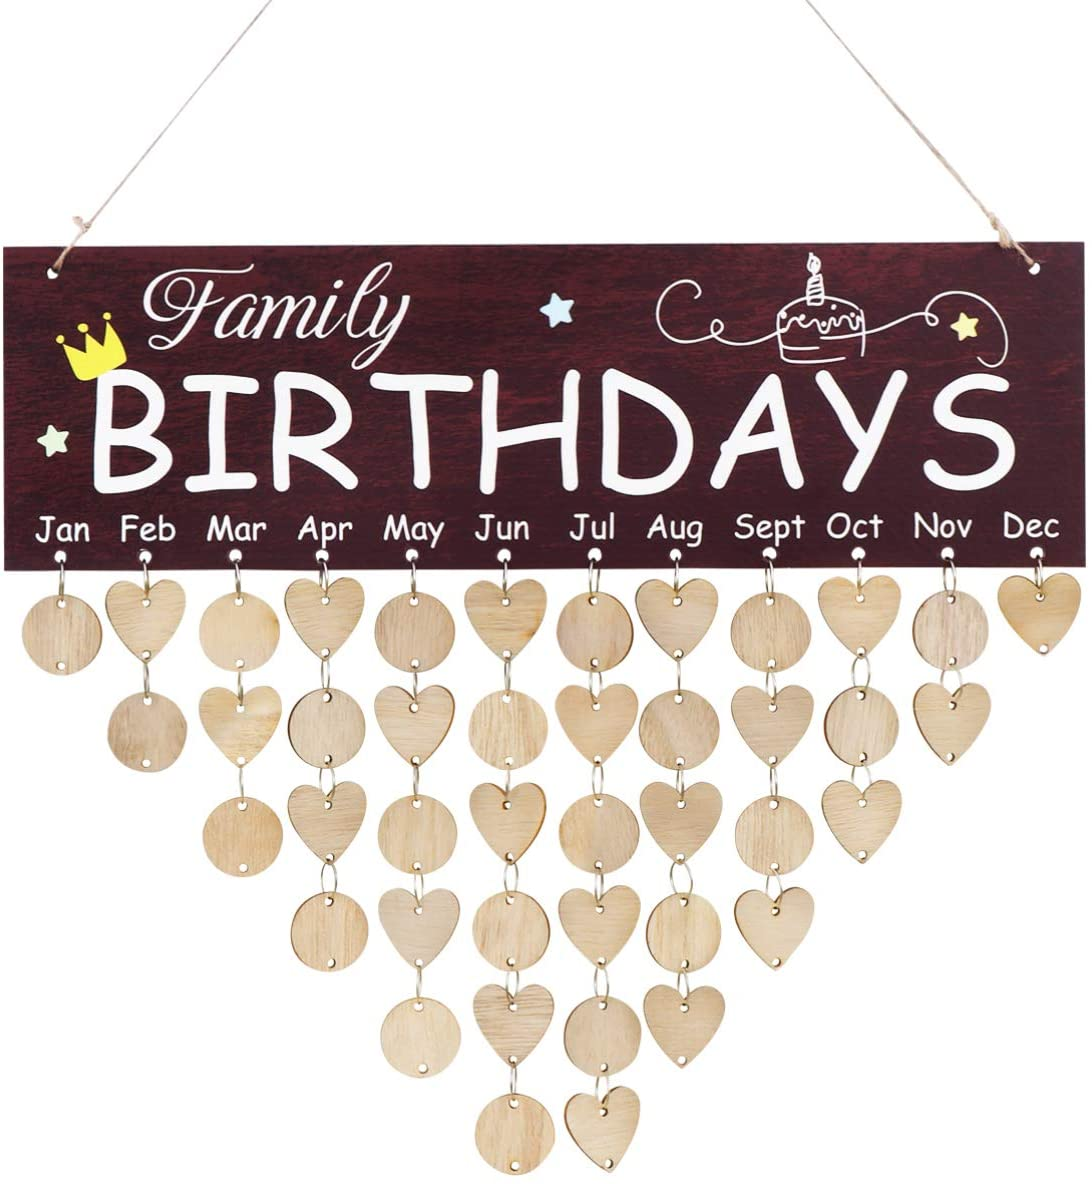 VOSAREA Family Birthday Board,Wooden DIY Calendar,Wall Hanging Calendar, Anniversary Birthday Reminder Plaque Memo Calendar Home Decor for Club Home Office